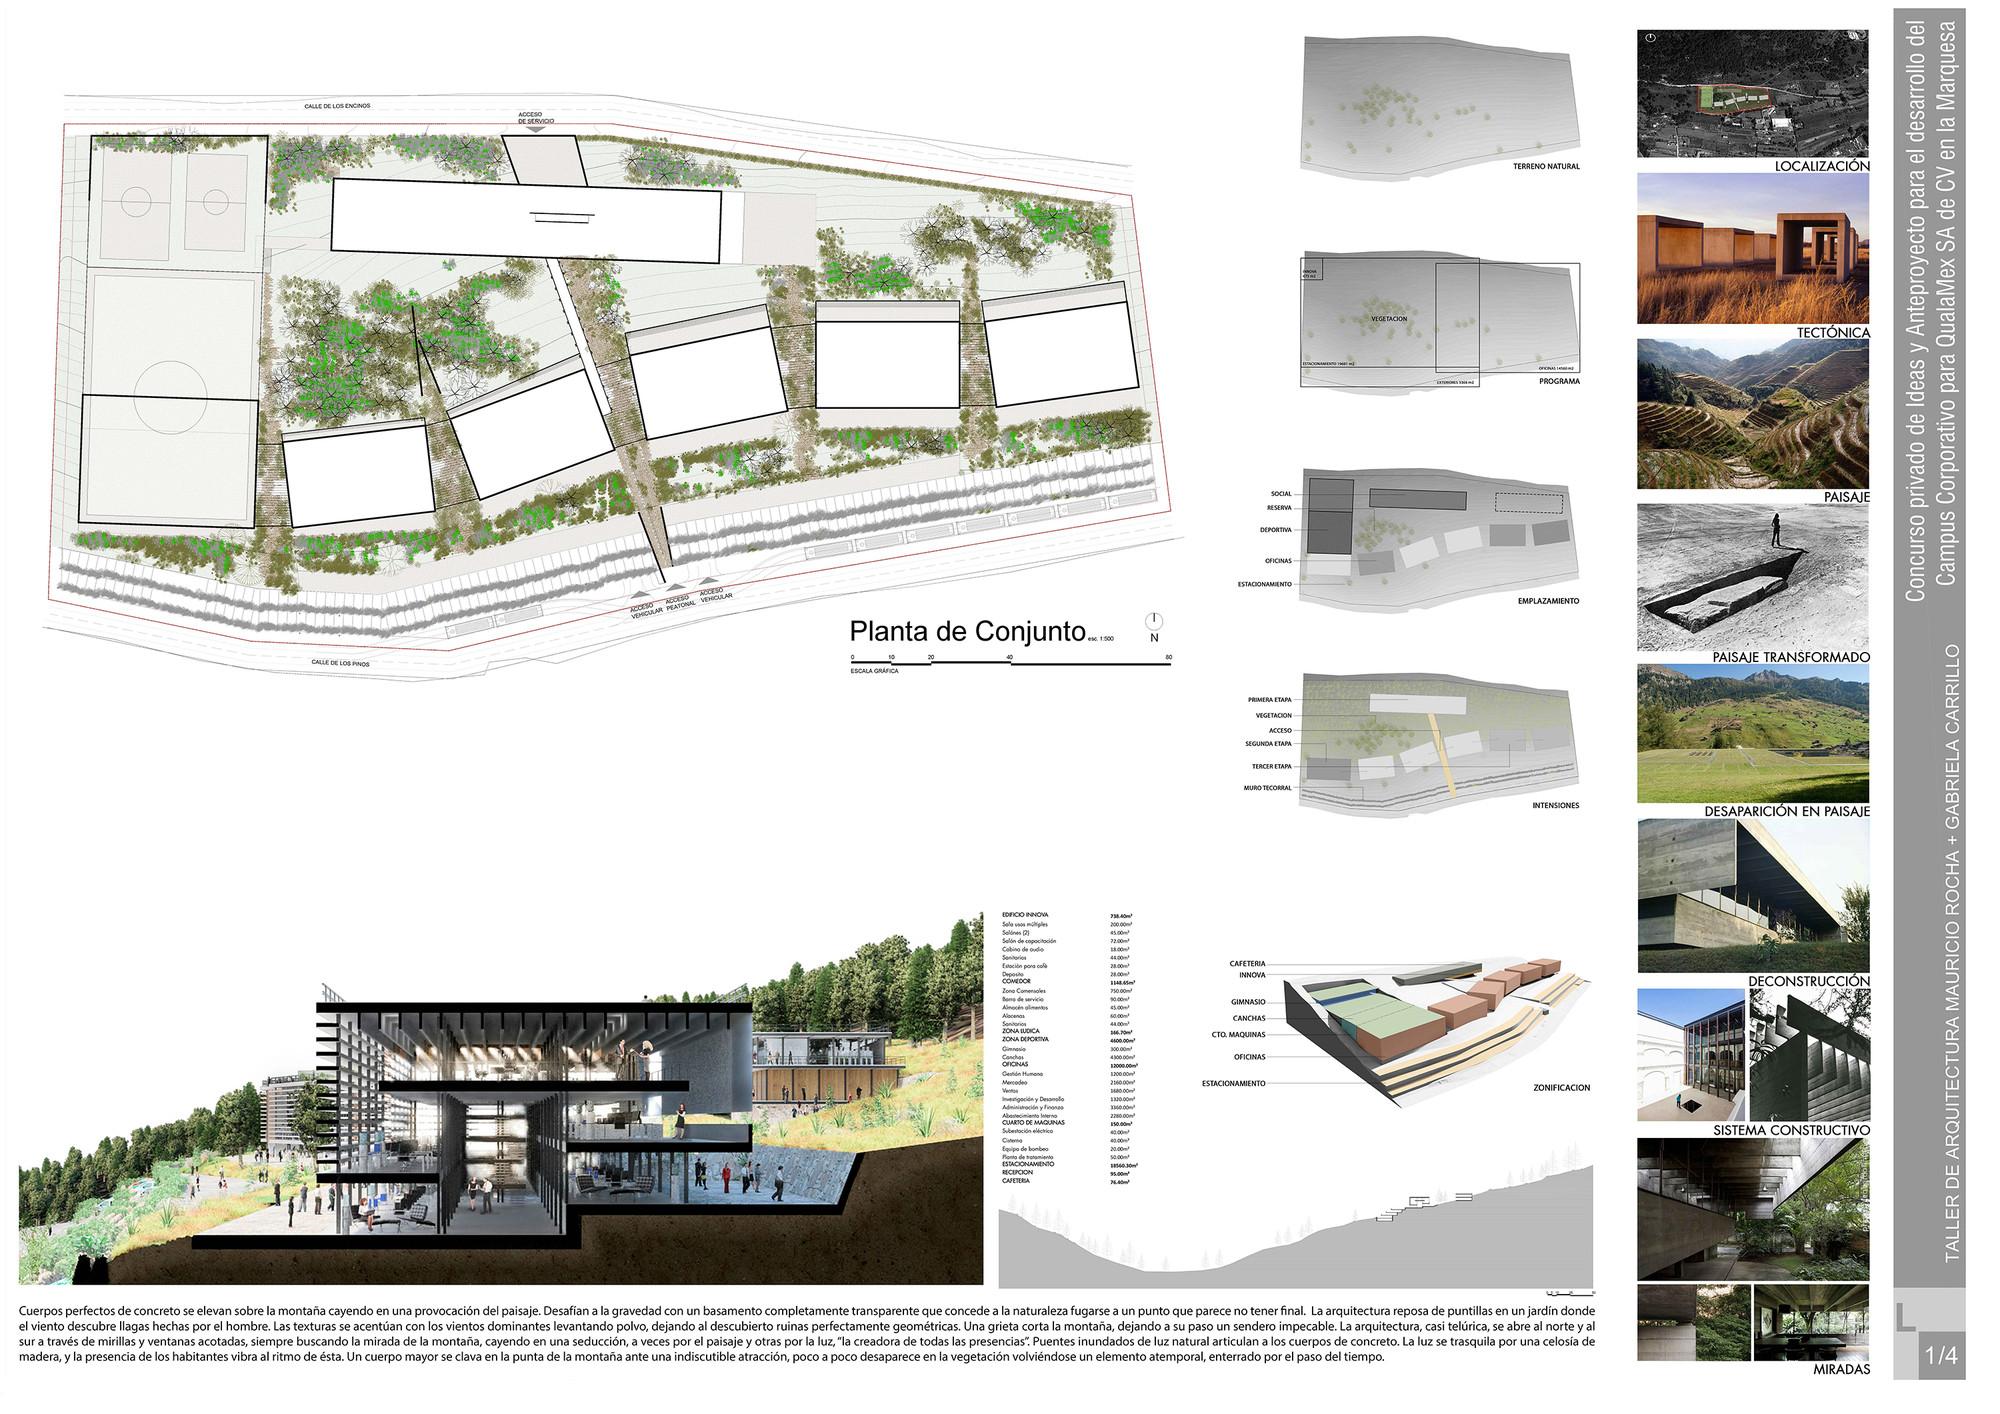 Lámina 1 / Propuesta de Taller de Arquitectura